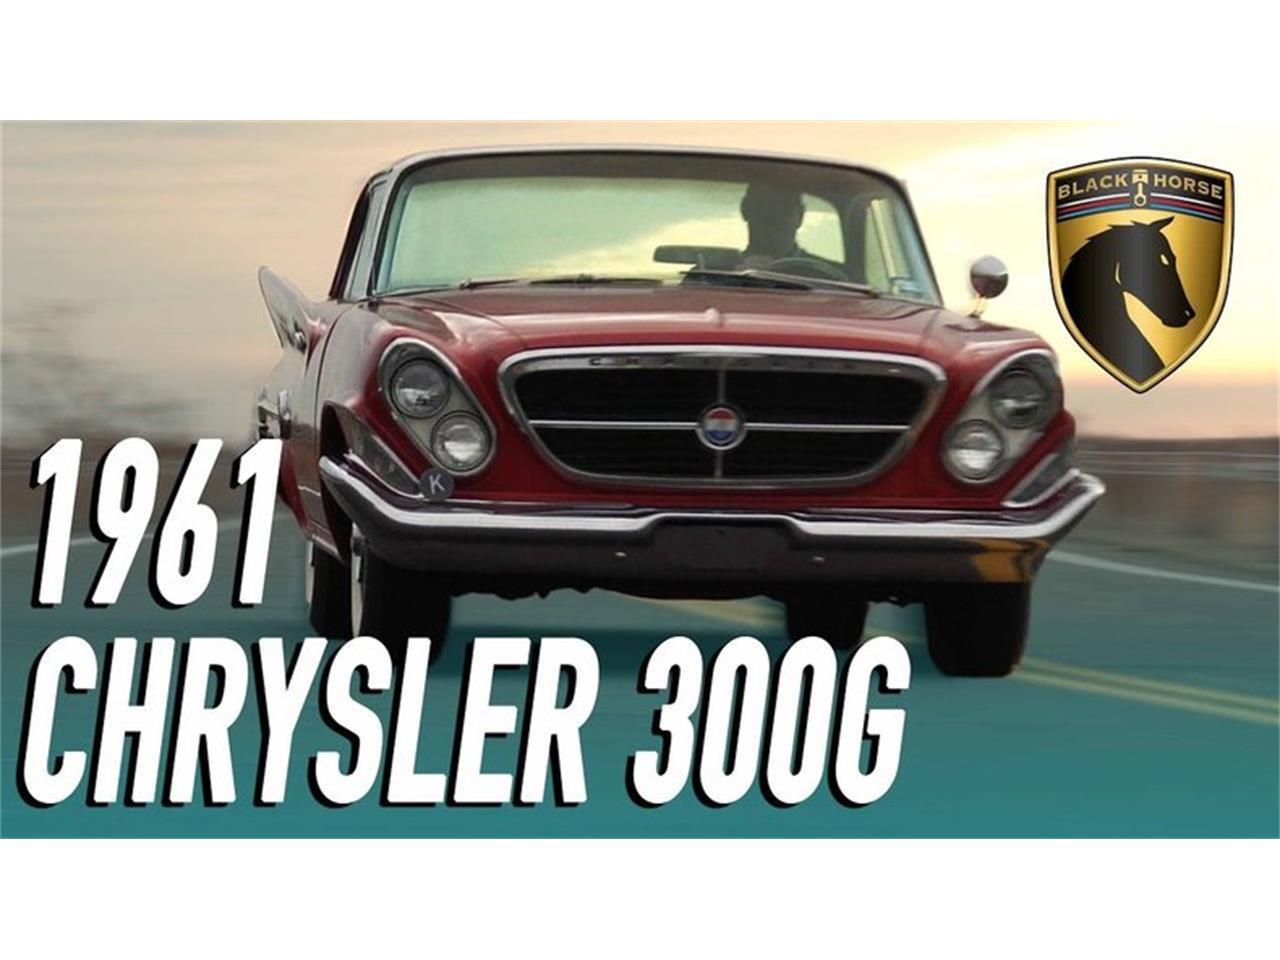 1961 Chrysler 300G (CC-1346084) for sale in Bridgeport, Connecticut